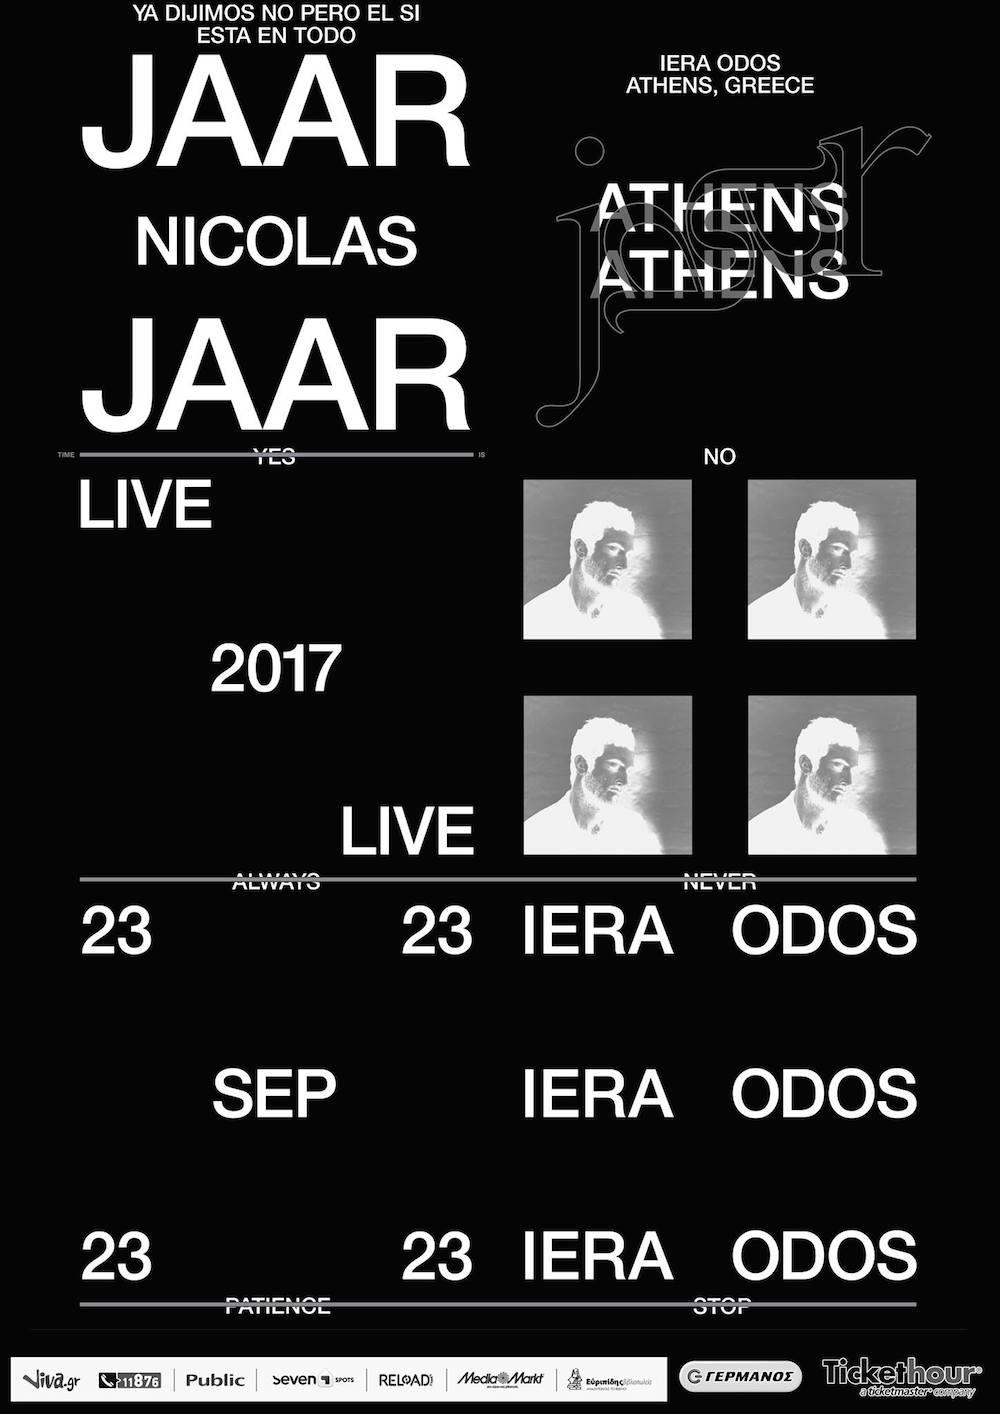 news/170917-nicolas-jaar-athens-thessaloniki-2017-02.jpg